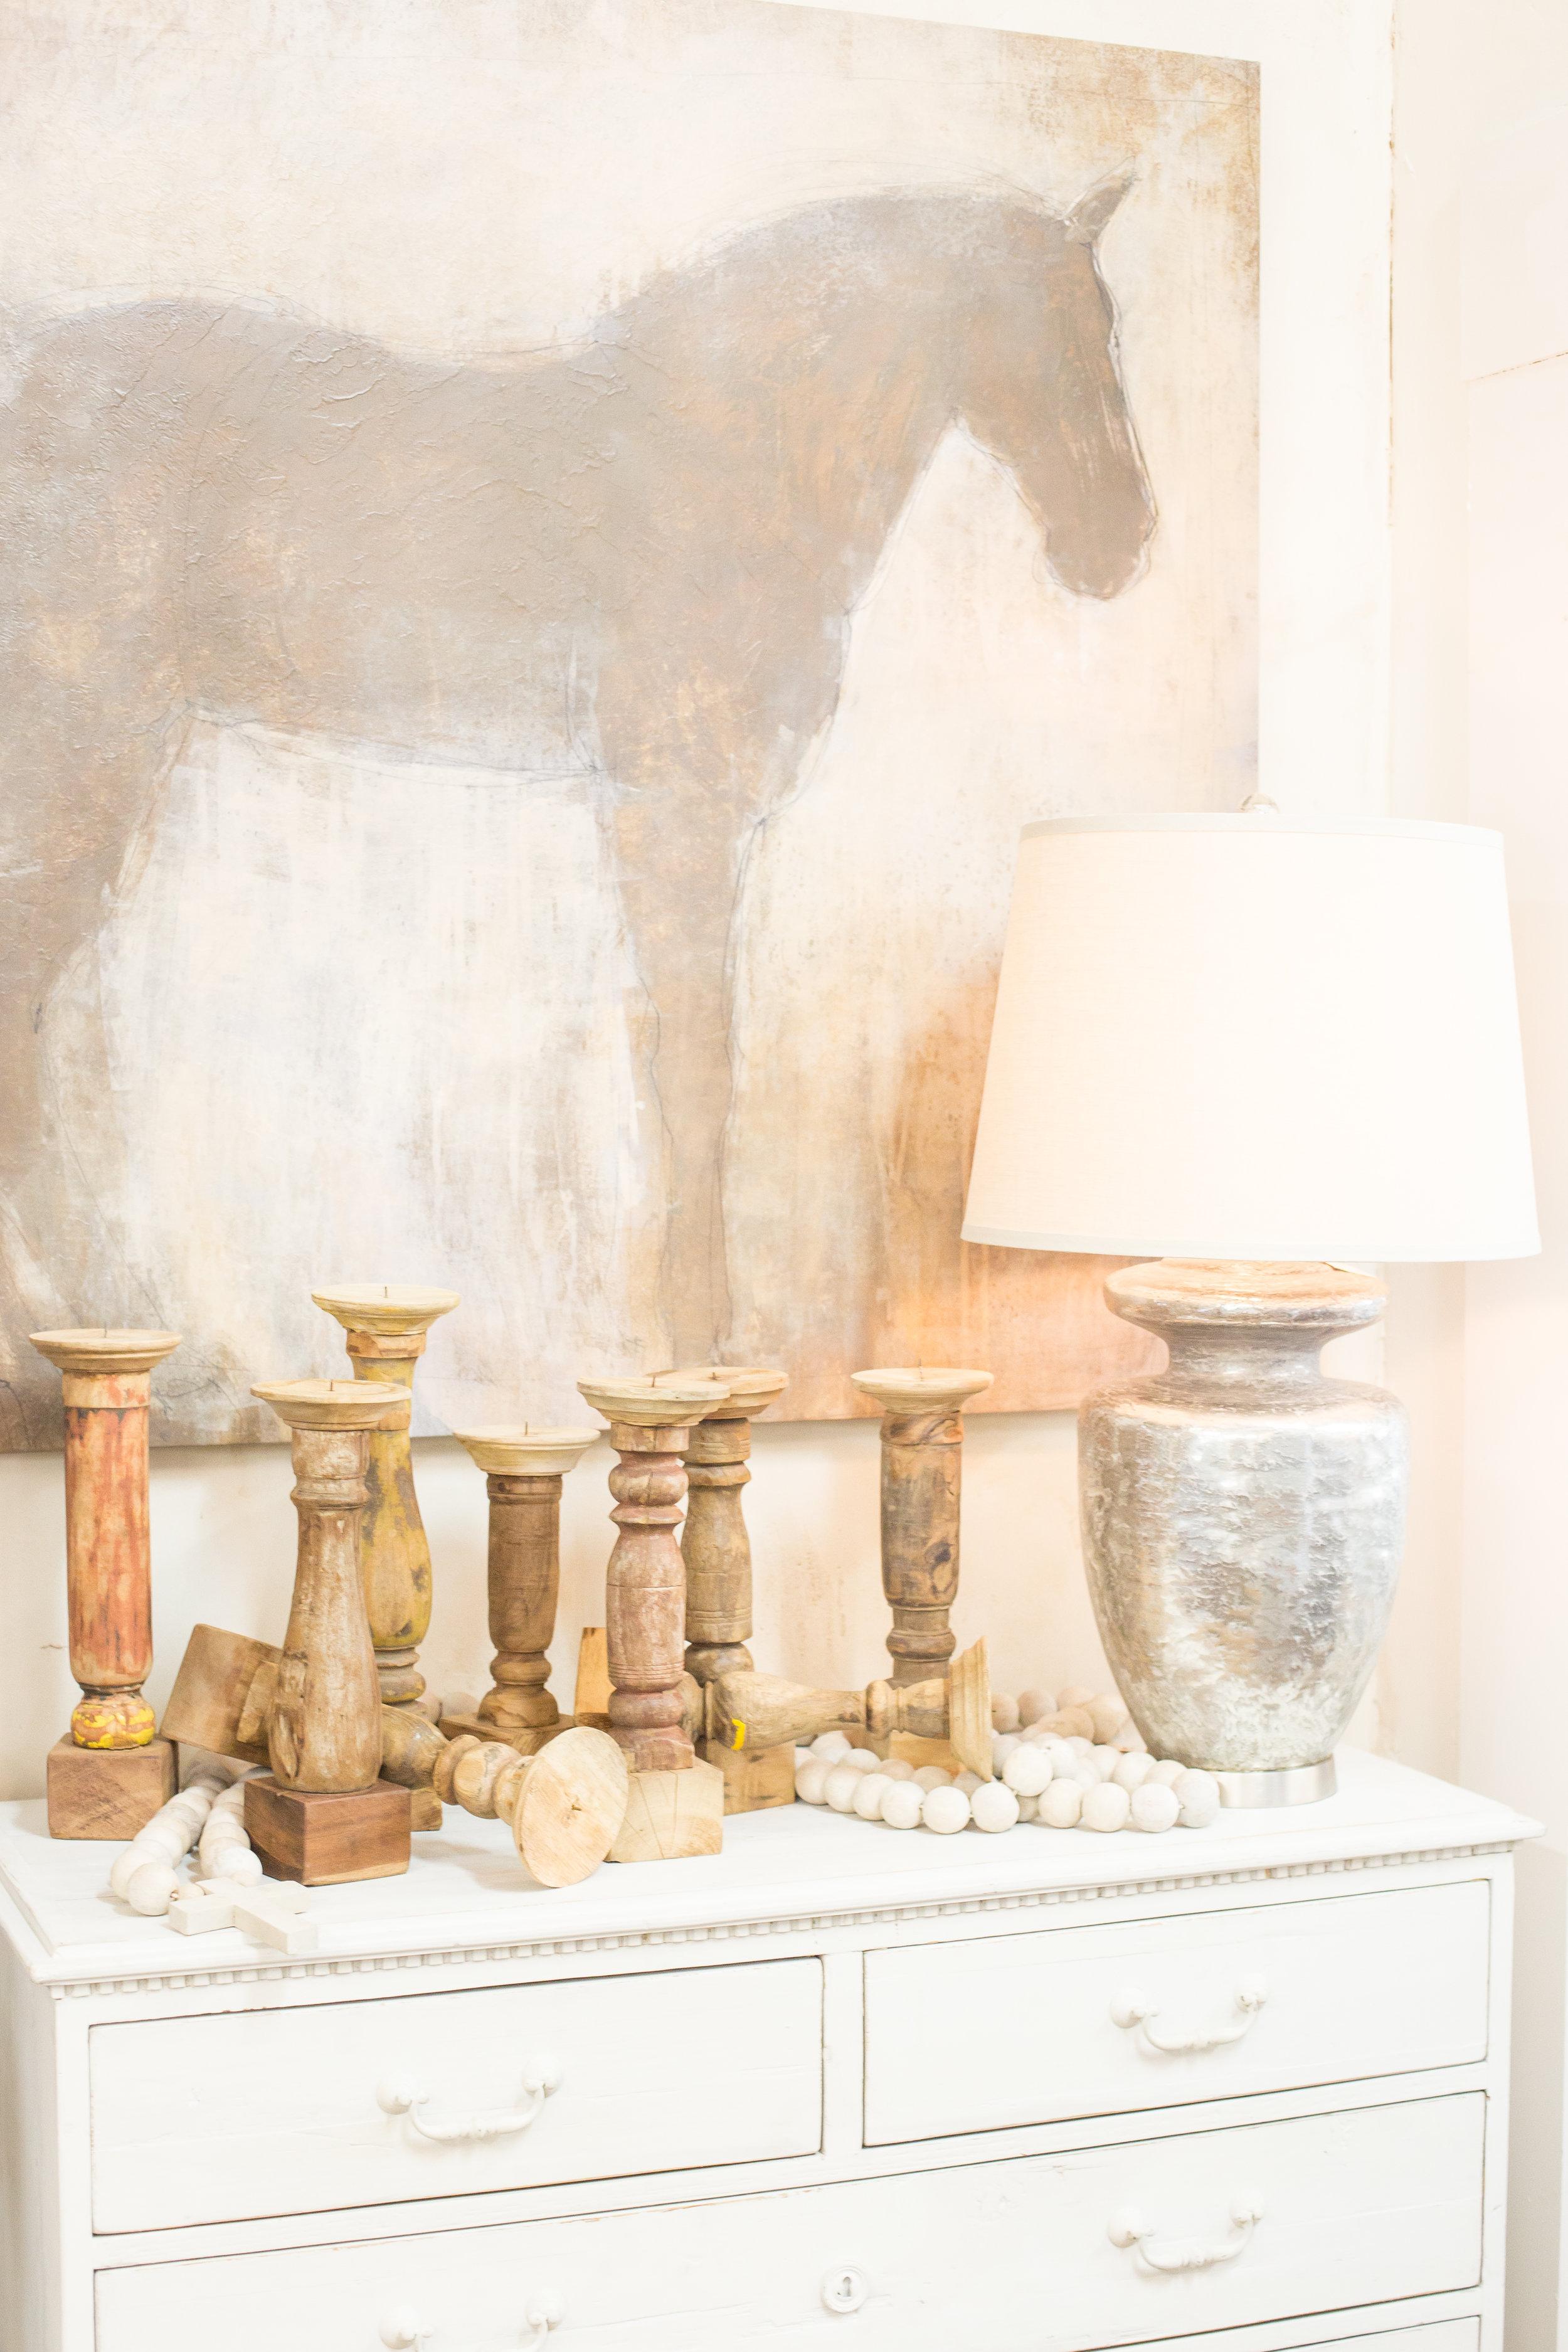 Wood decor, artwork